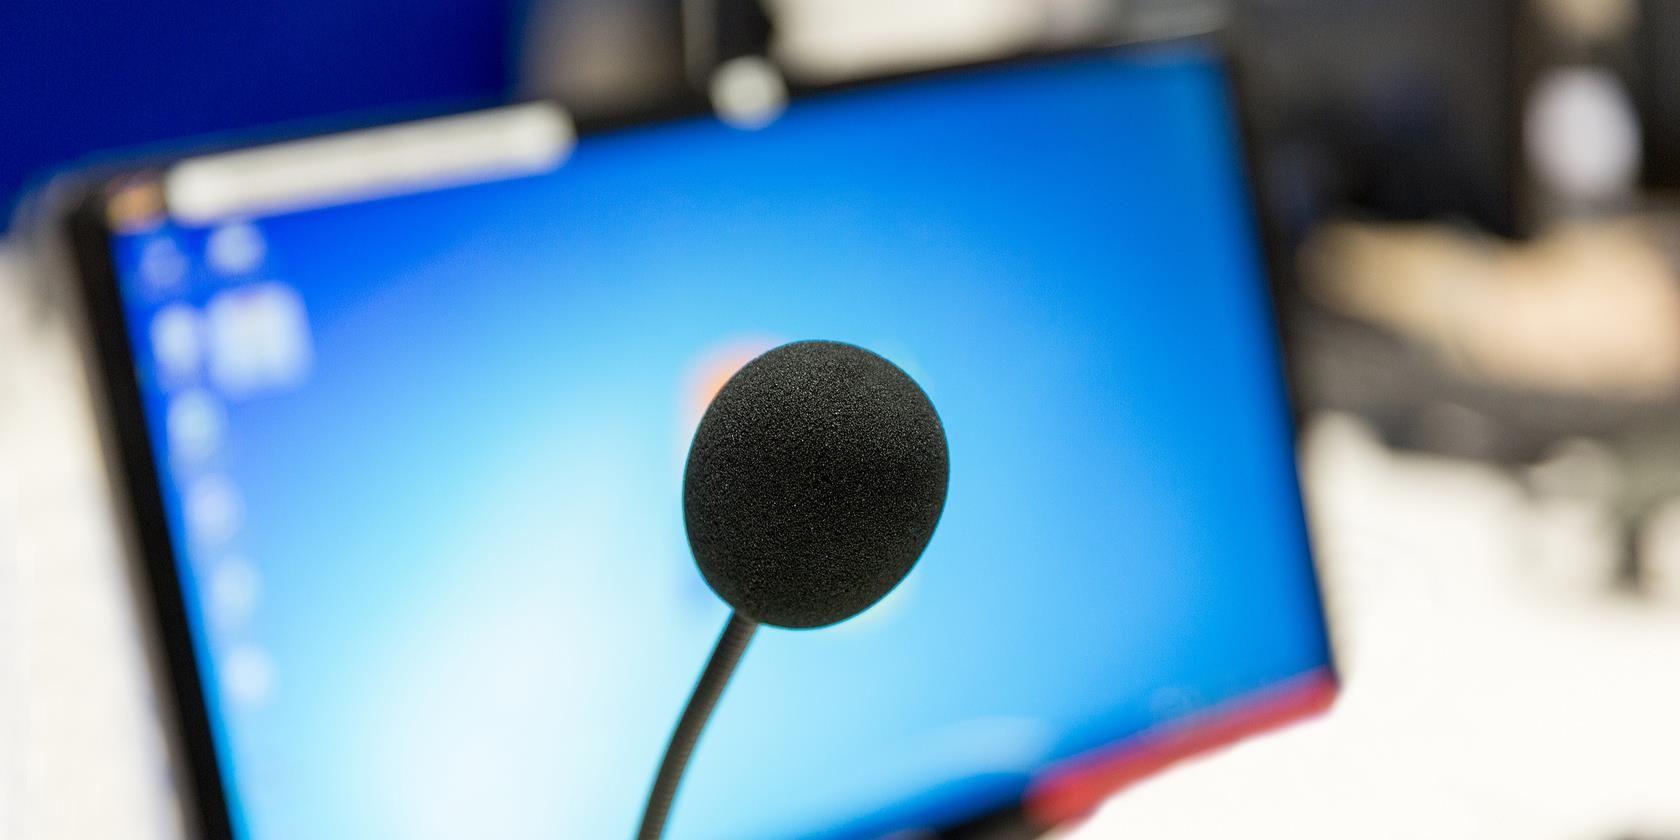 Persuasive speech on linux versus windows